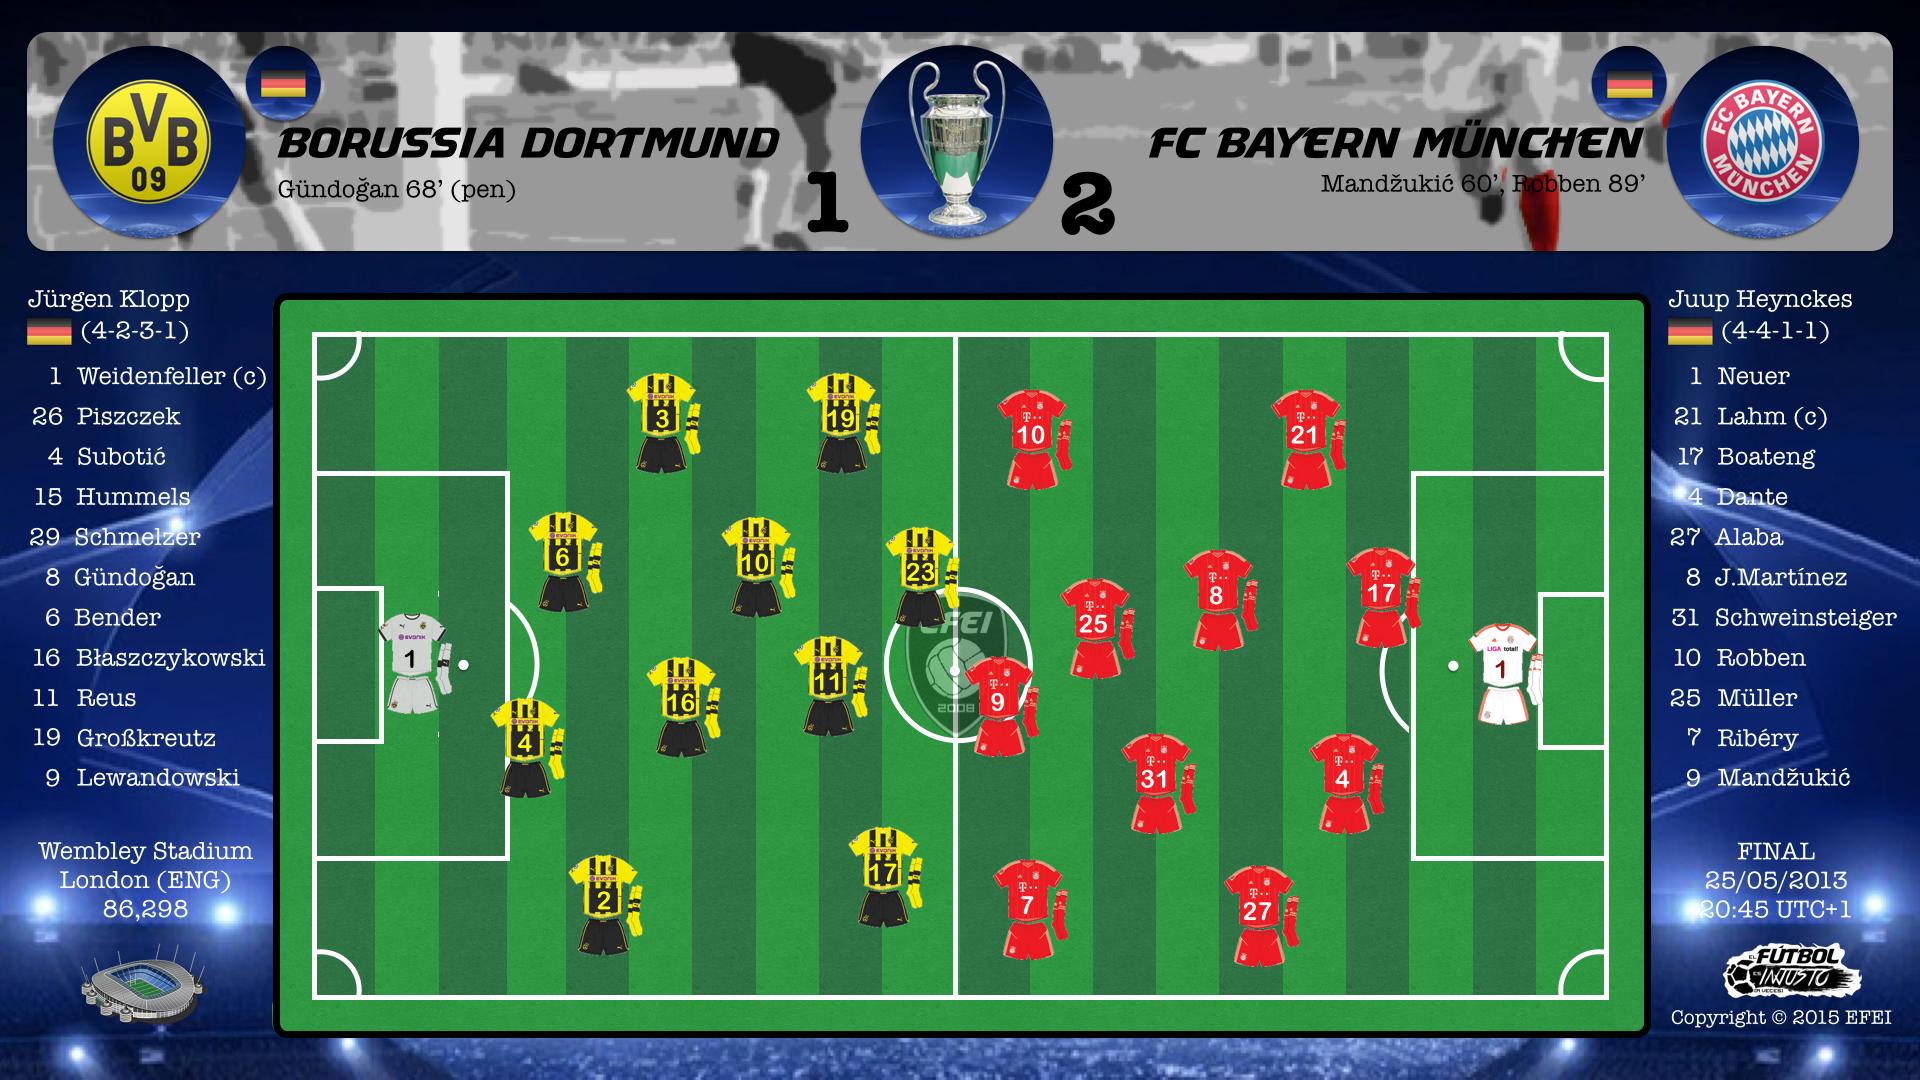 UEFA Champions League Final 2013 Borussia Dortmund Bayern München